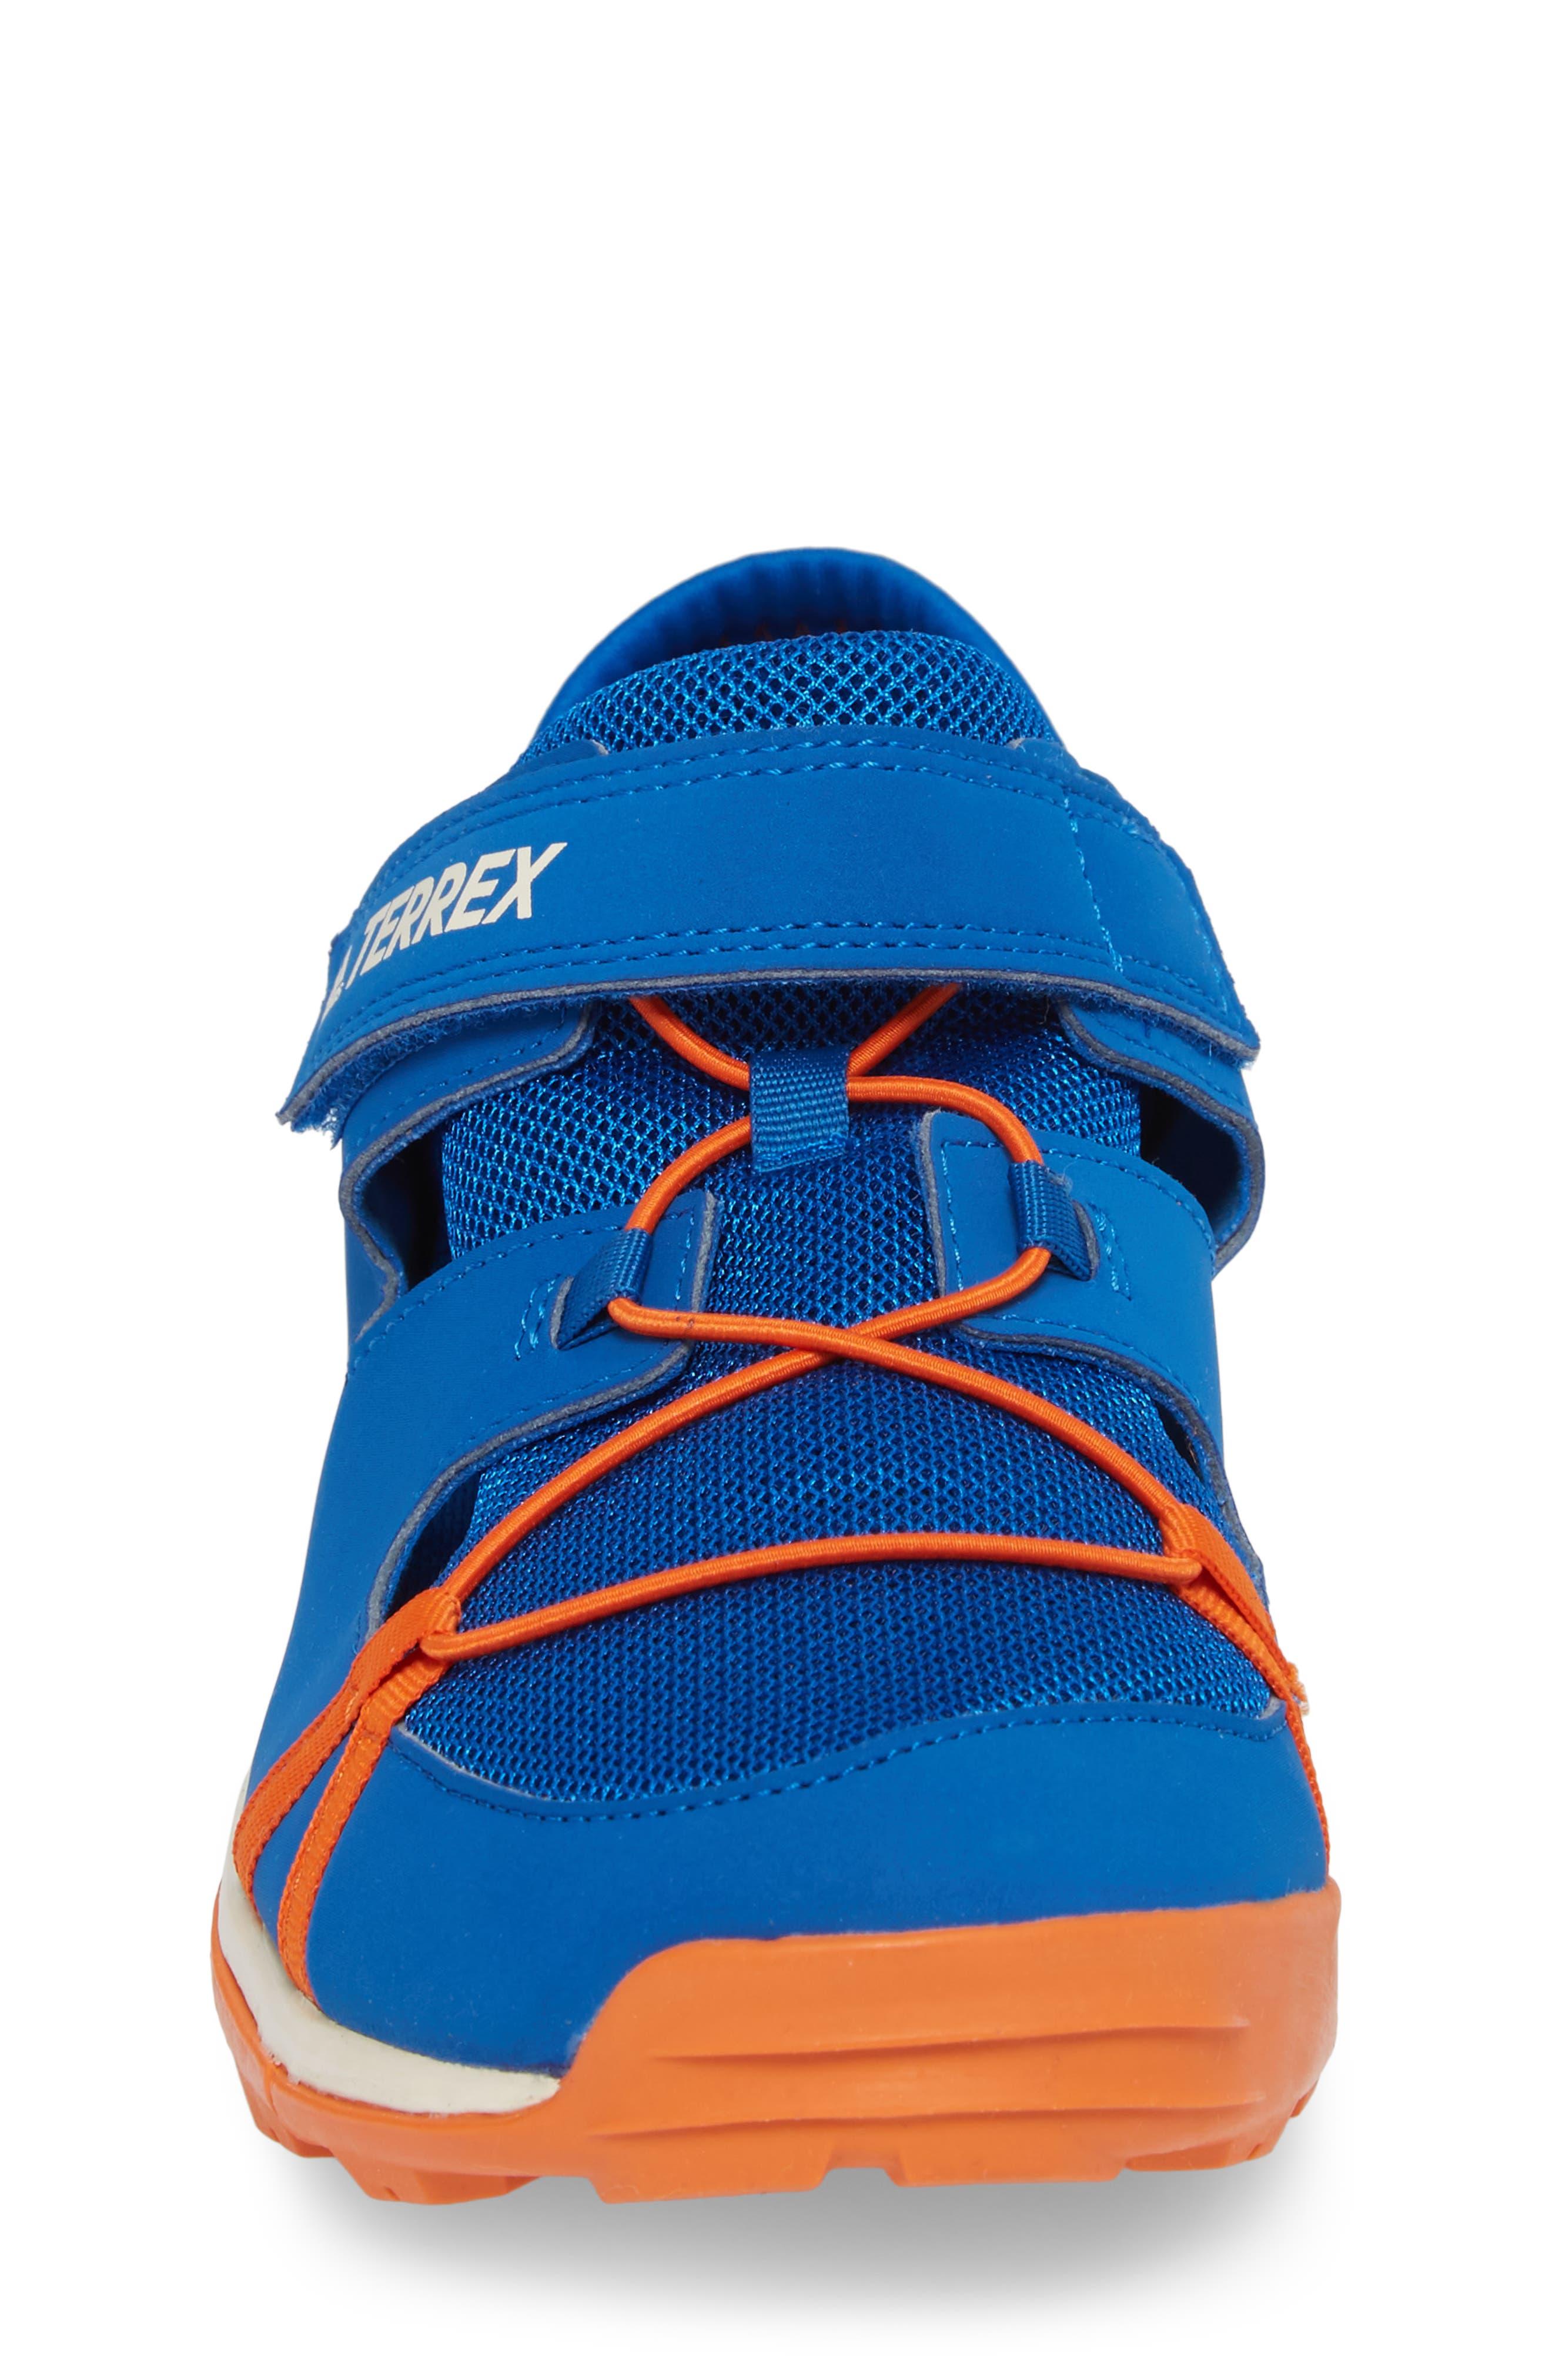 Terrex Tivid Sneaker,                             Alternate thumbnail 4, color,                             BLUE/ ORANGE/ CHALK WHITE